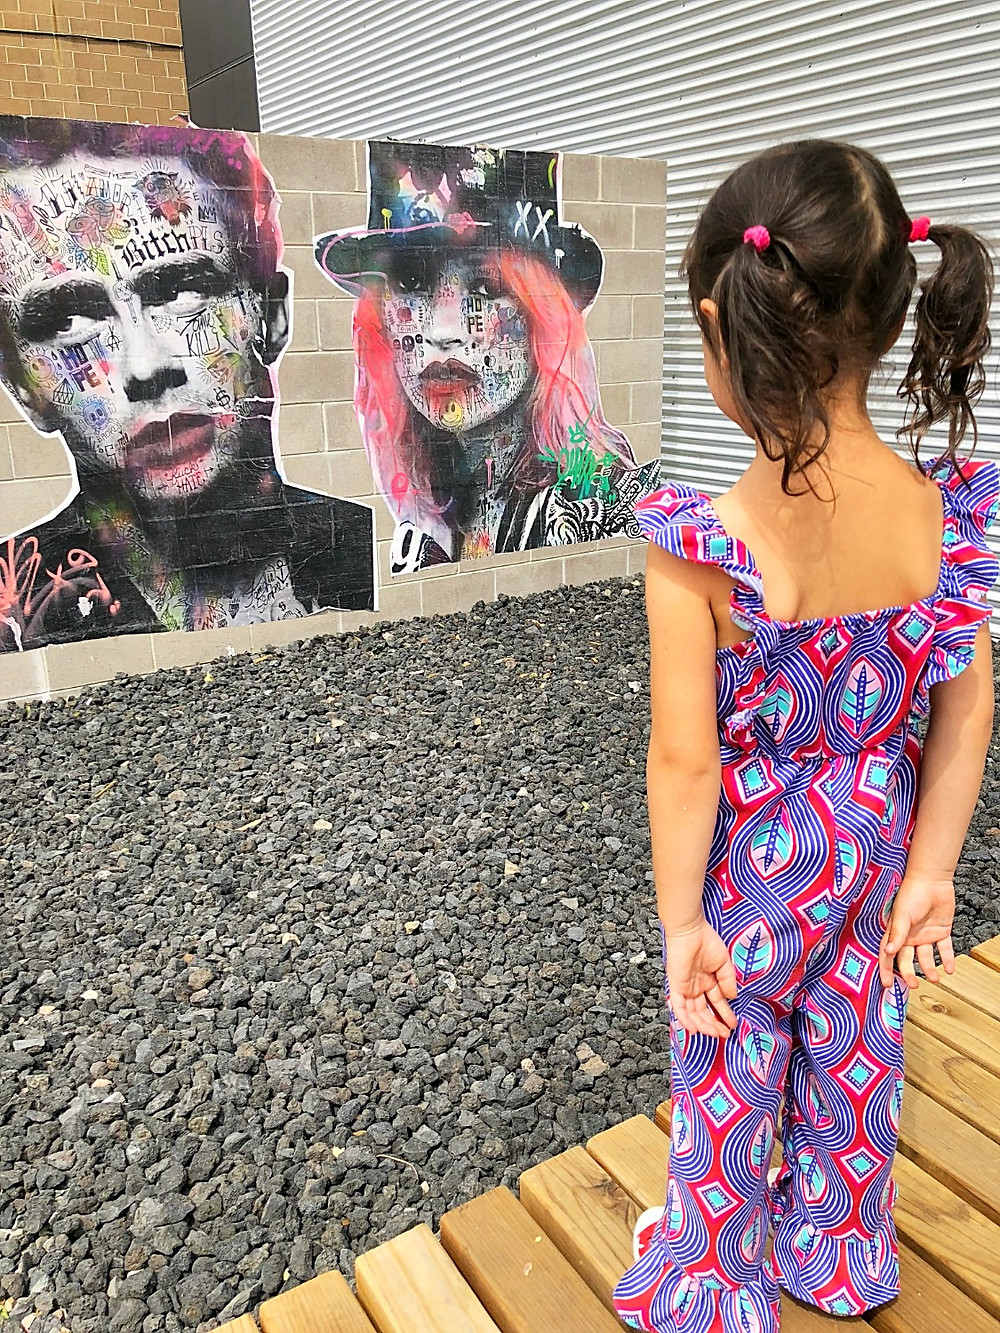 Denver with kids, RiNo, River North Arts District, Crush Walls, Denver art, Kate Moss, James Dean, Zeppelin Station